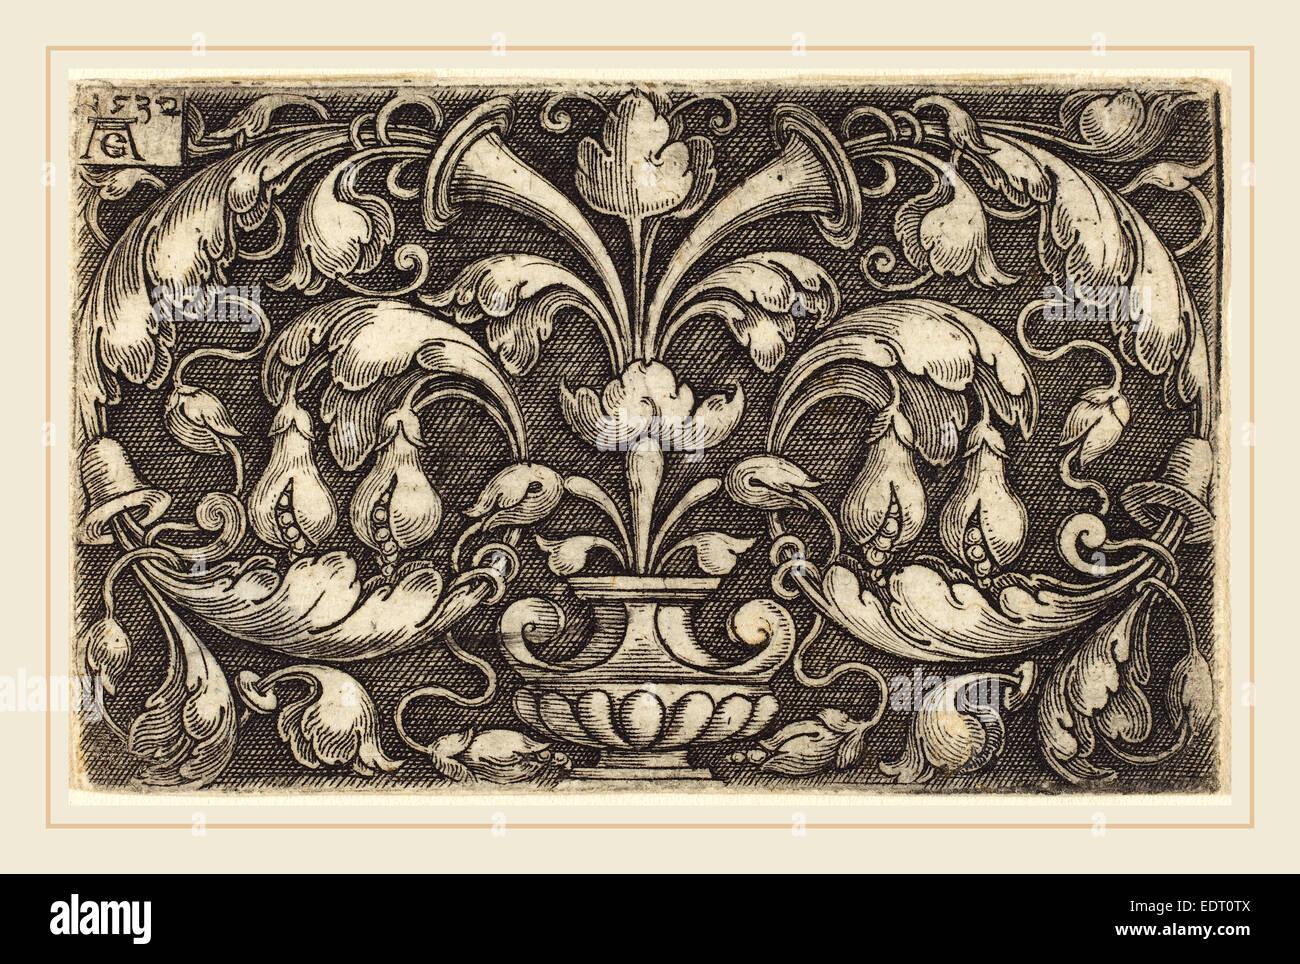 Heinrich Aldegrever (German, 1502-1555-1561), Ornament, 1532, - Stock Image